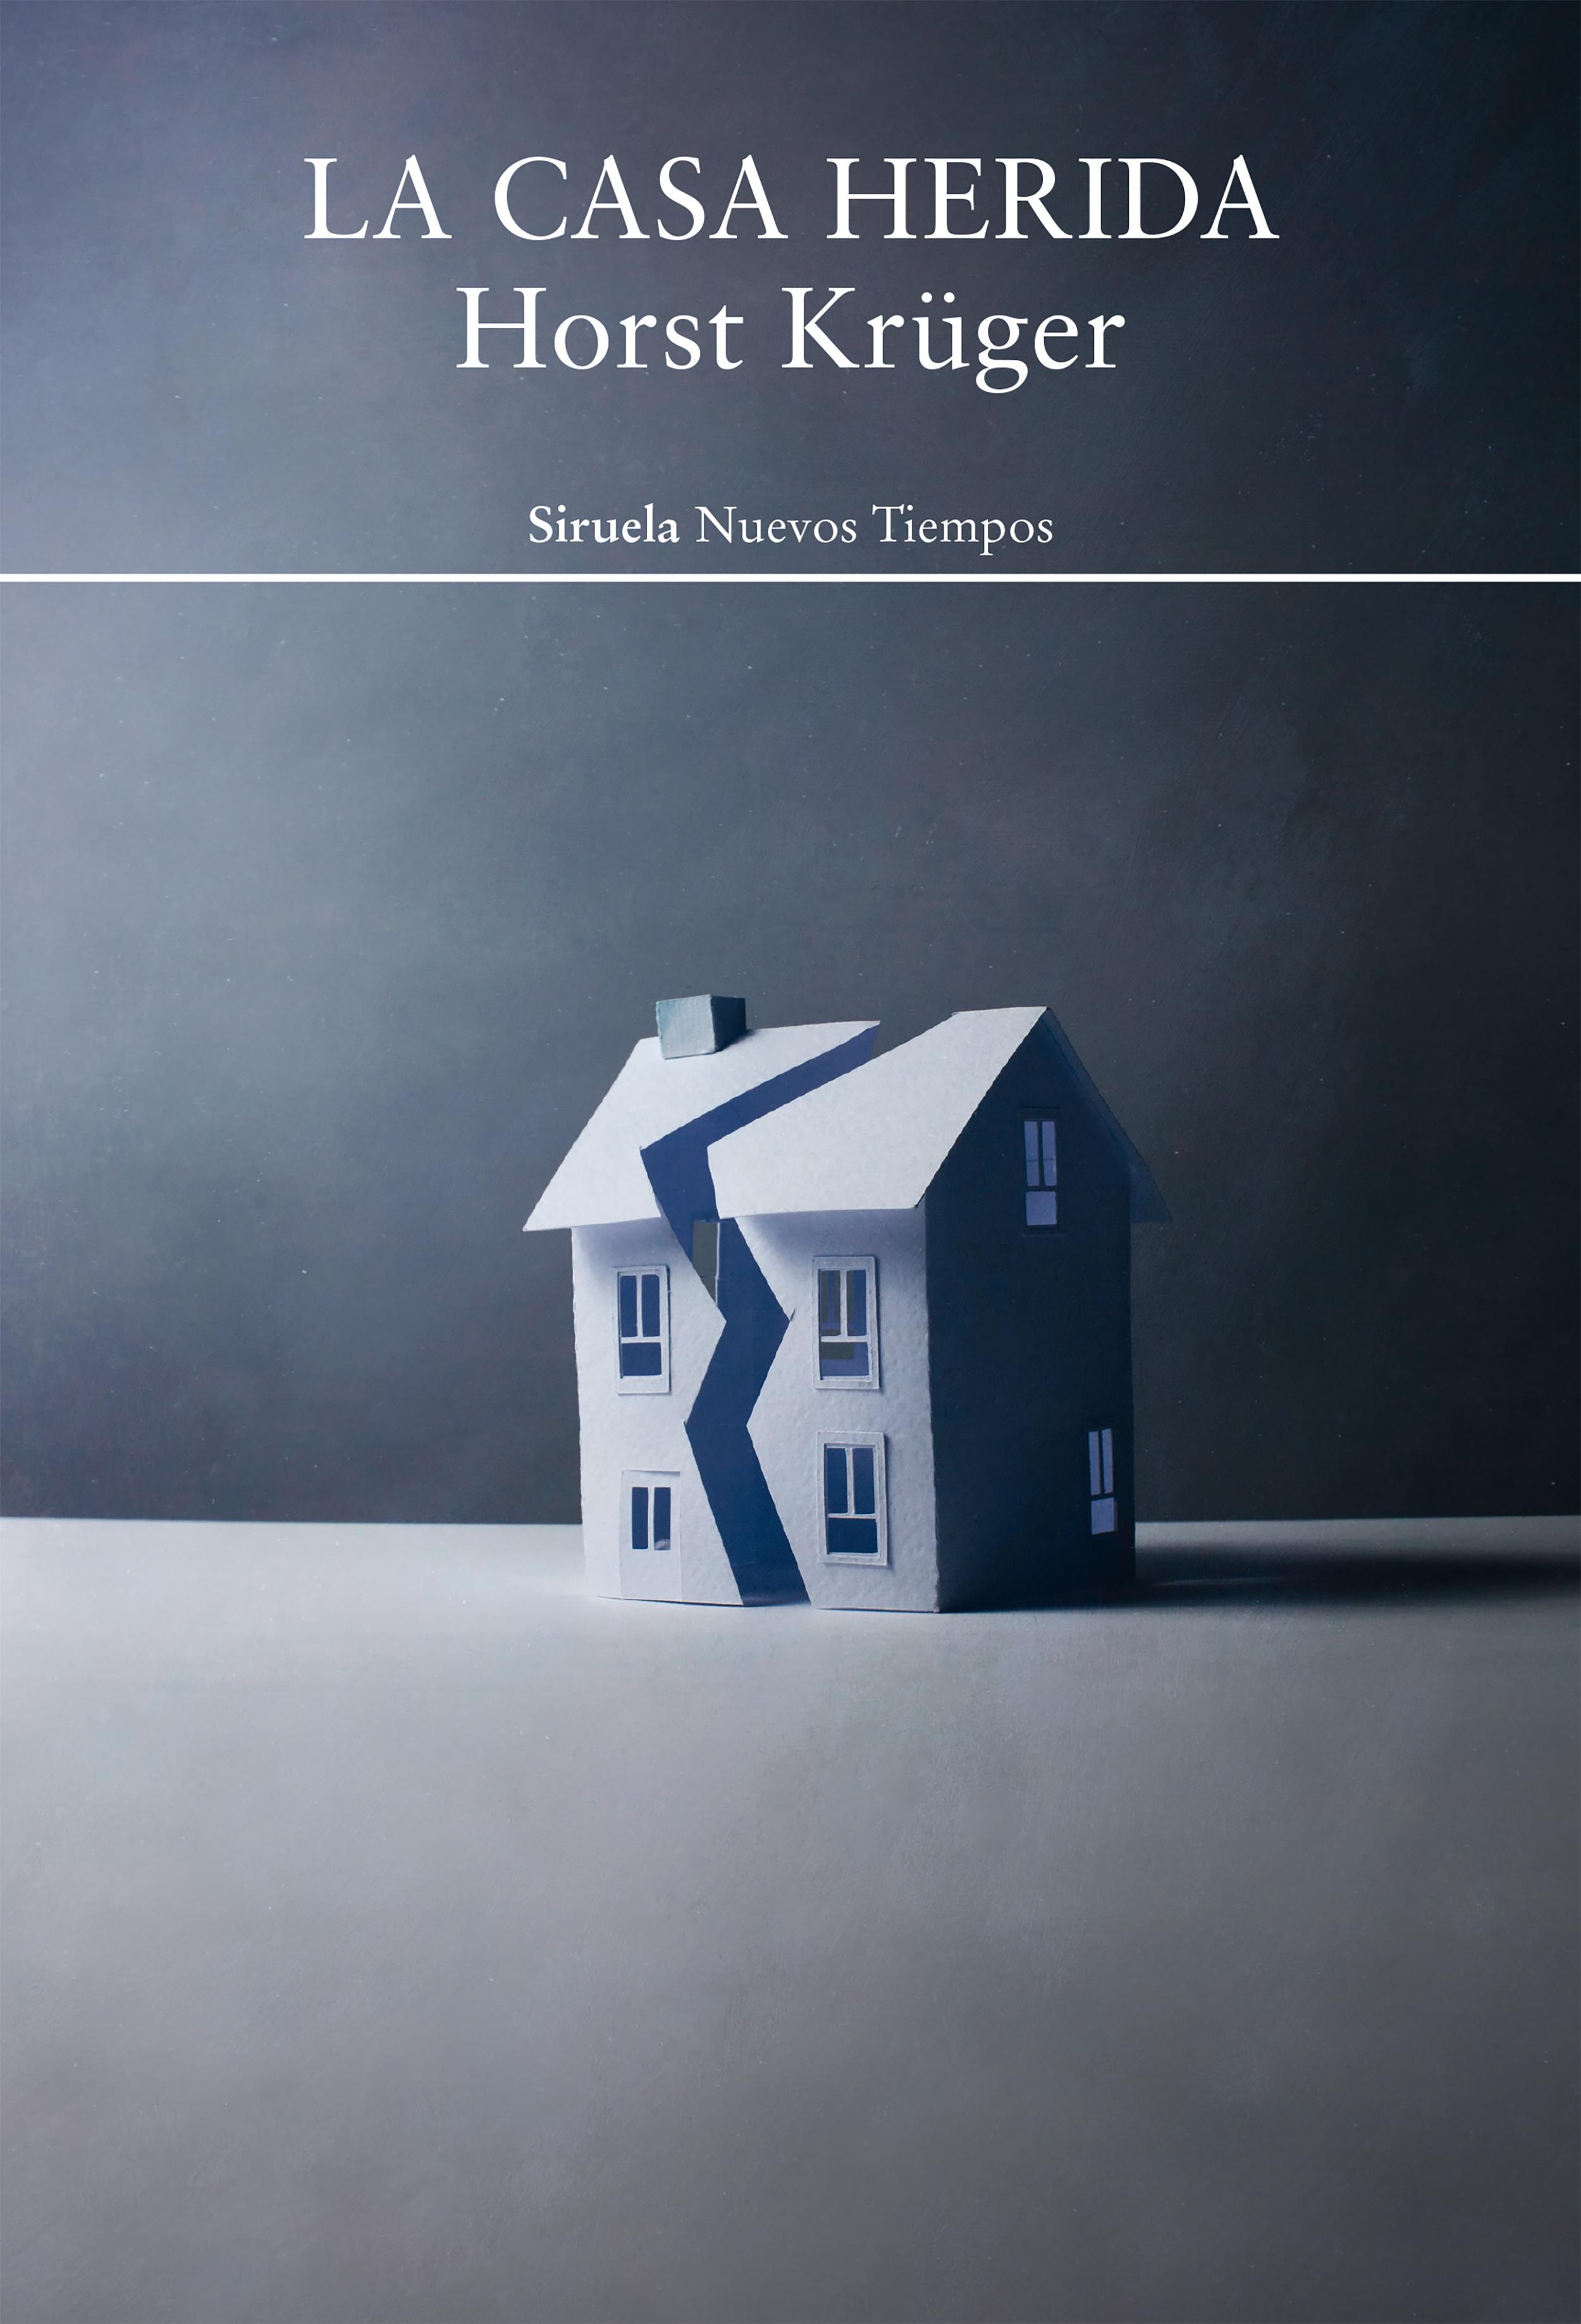 La casa herida